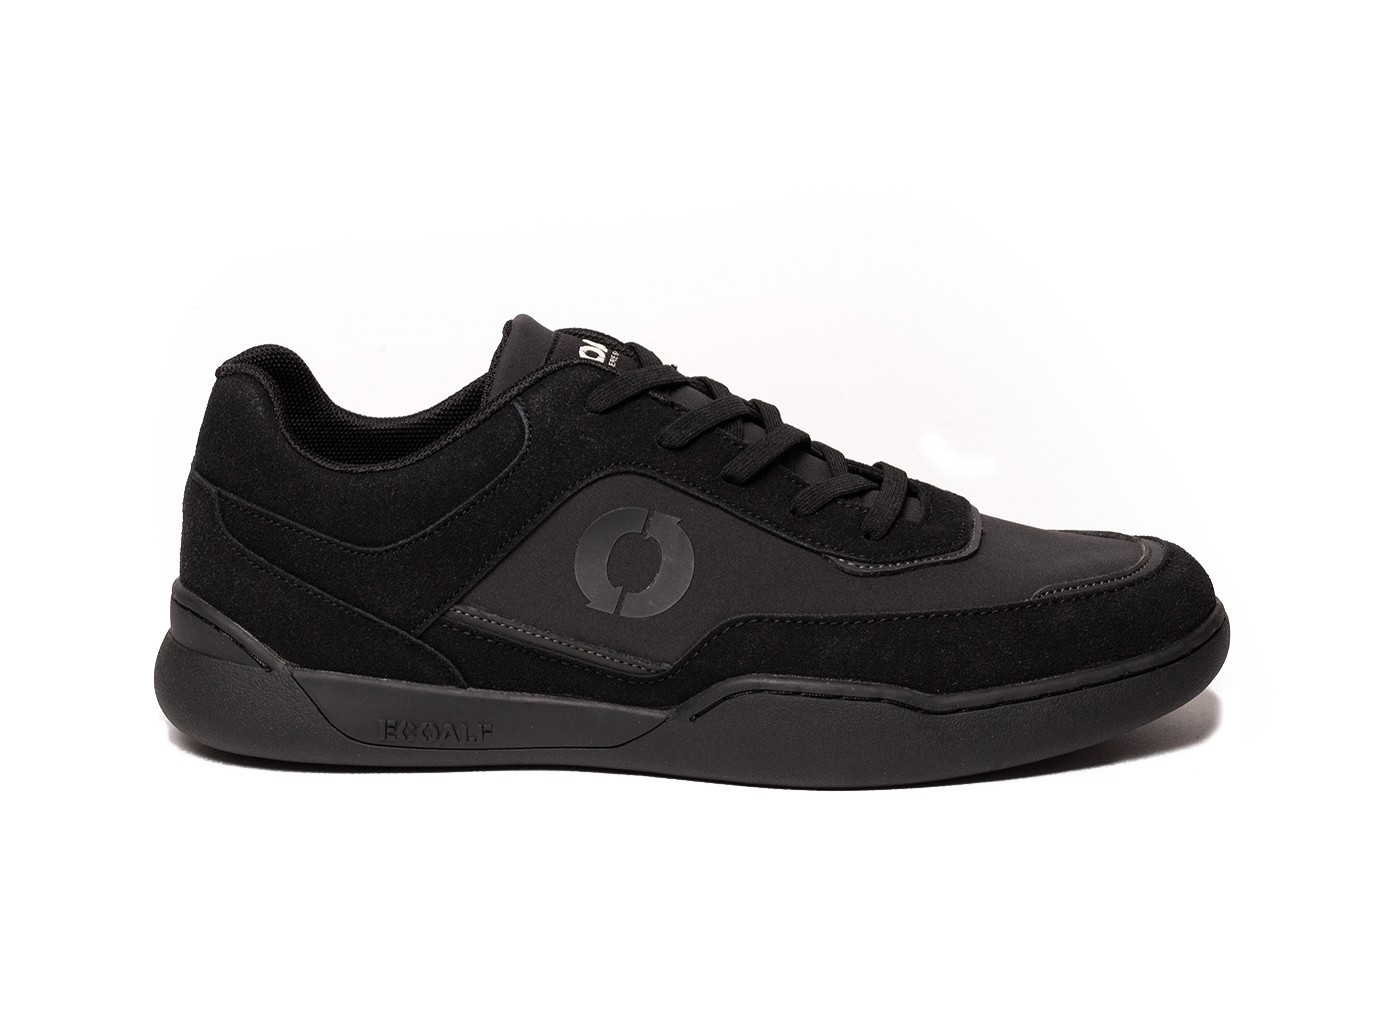 ecoalf class sneakers vegan impermeabili lacci nere